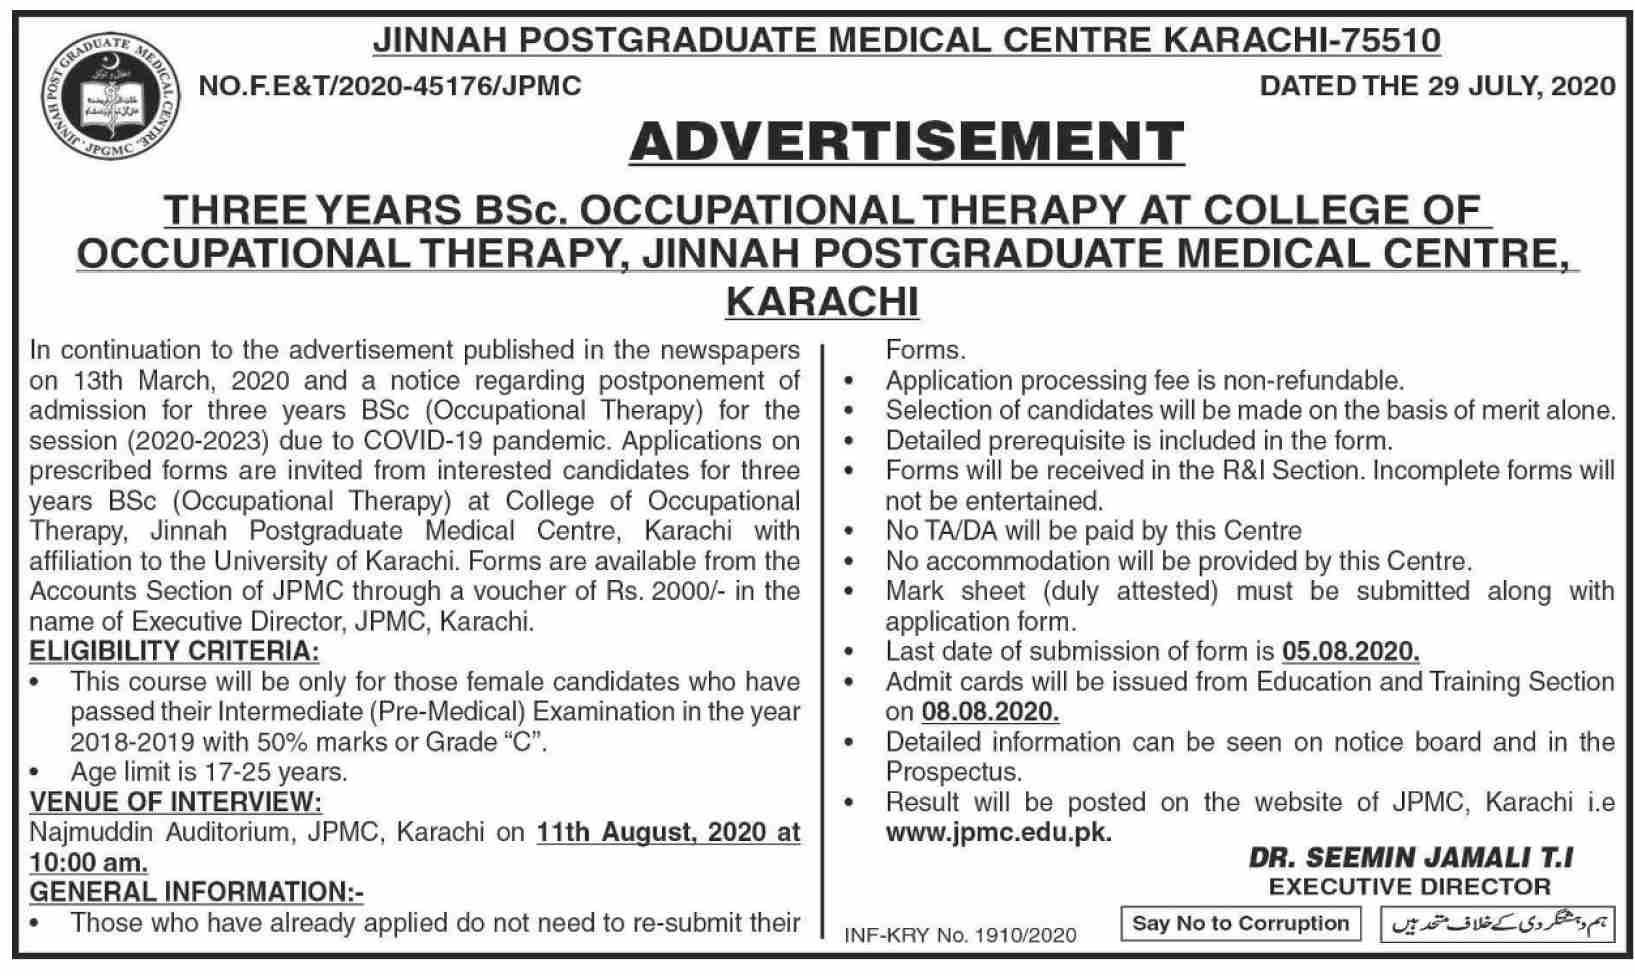 Jinnah Postgraduate Medical Centre Karachi Admissions